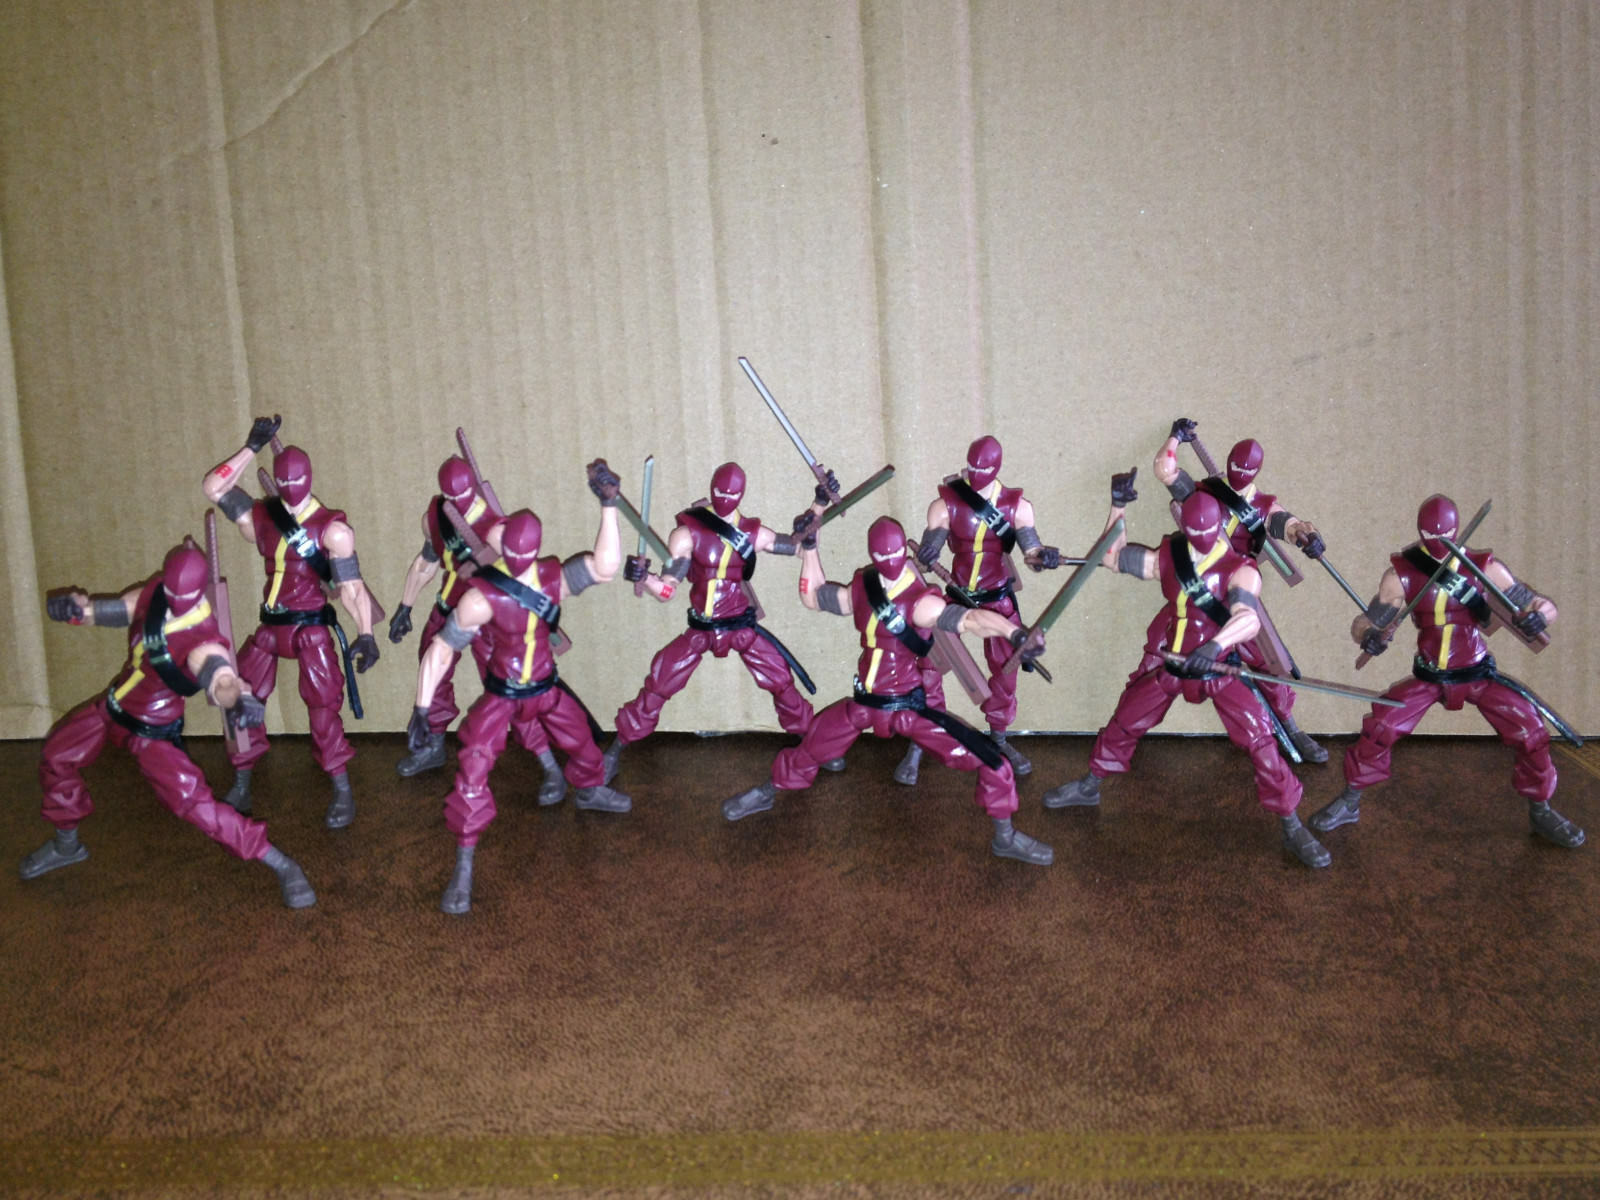 10x Gi-joe 30th aniversario Renegades Cobra Ninja Viper Figuras De Acción Hasbro